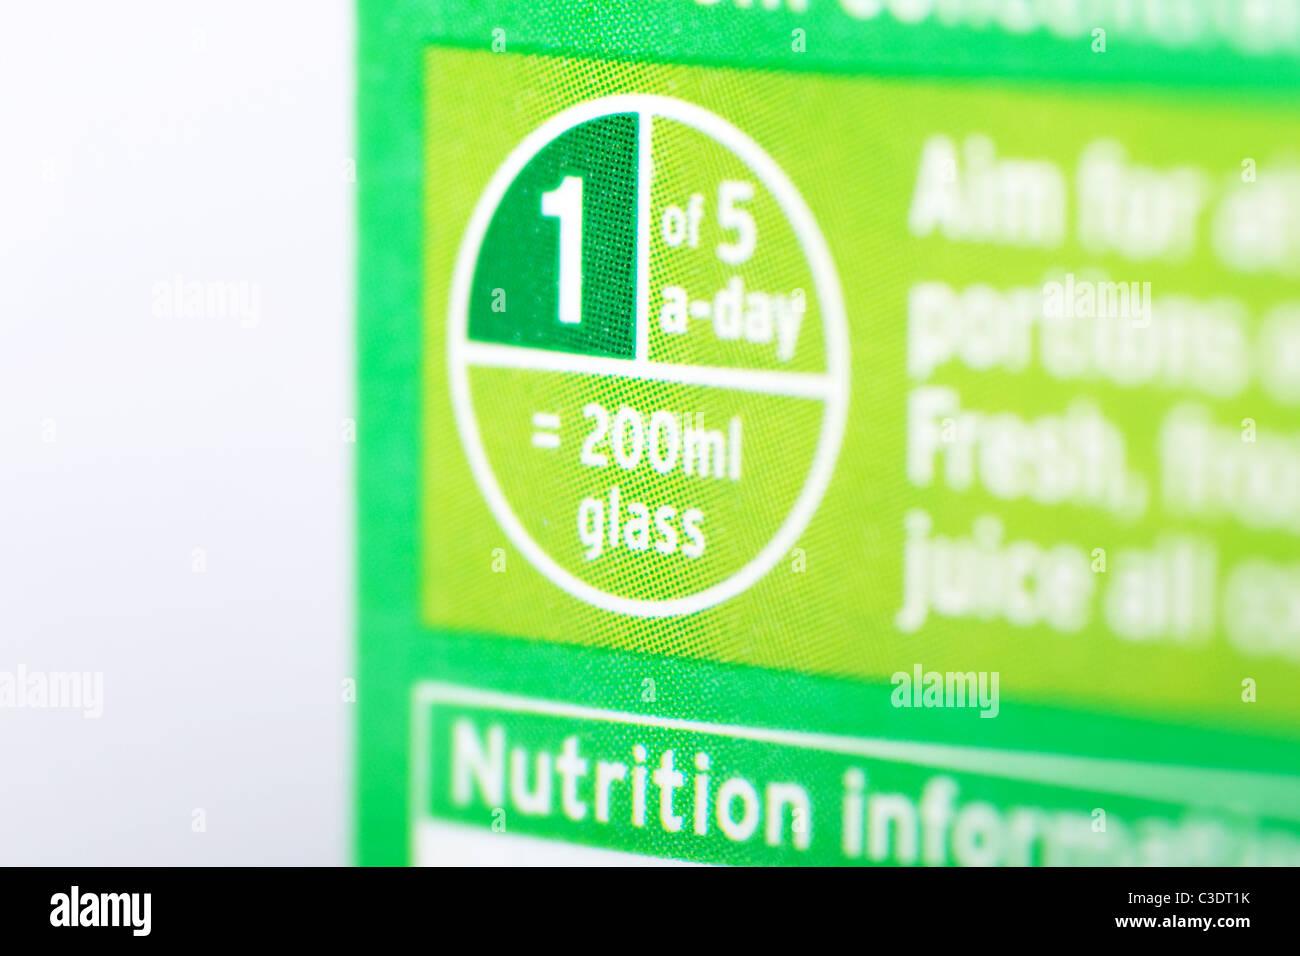 5 day branding labelling on a carton of Sainsburys apple juice - Stock Image